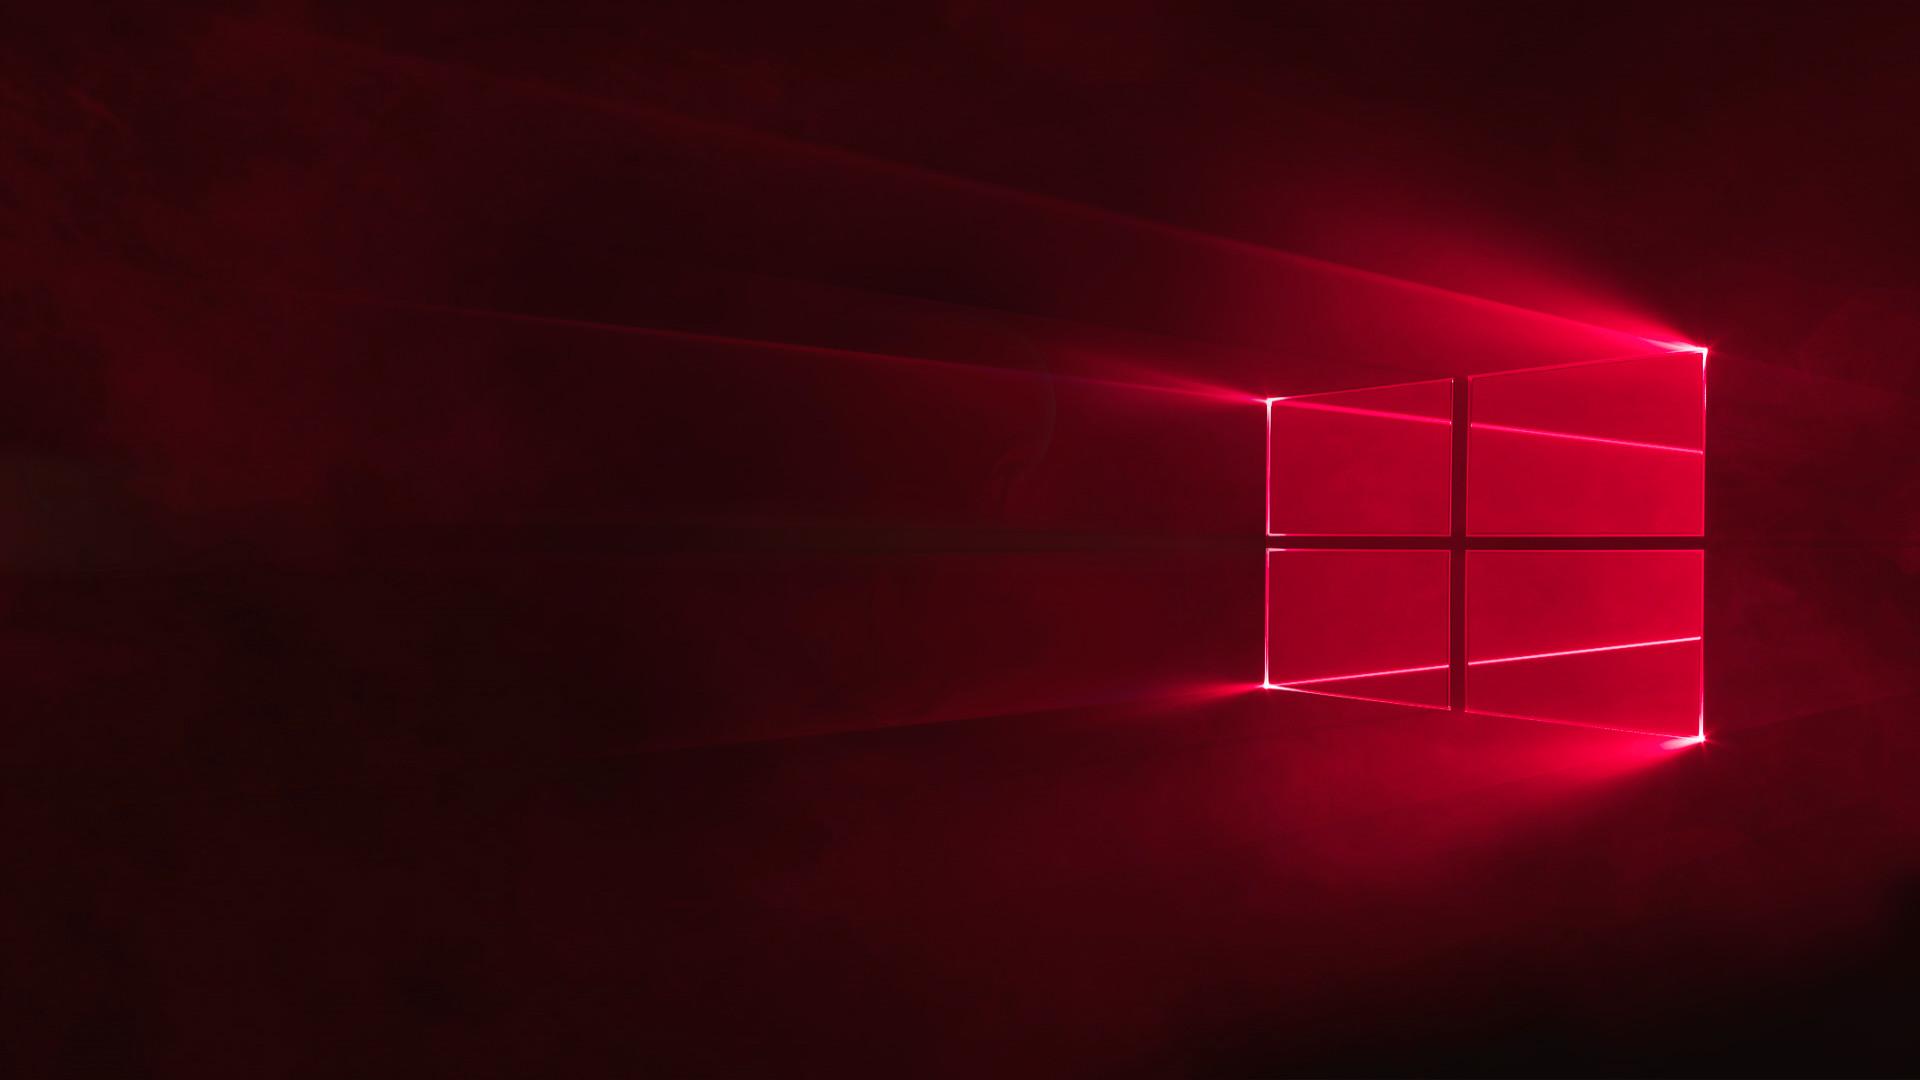 Windows 10 Redstone Wallpaper 85 Images